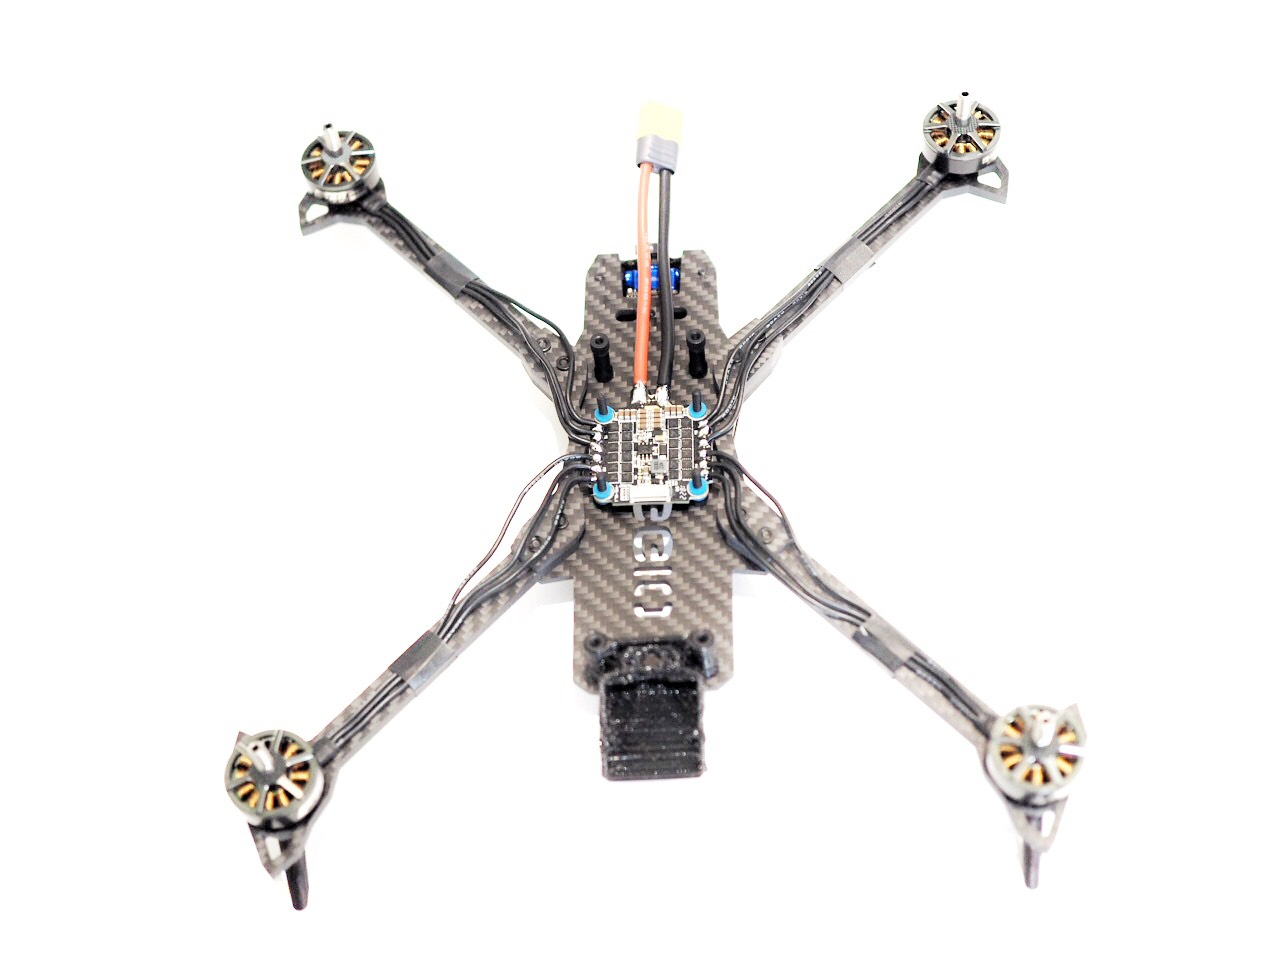 Long Range FPV Quadcopter Build Log - Raggio Lungo | GetFPV Learn